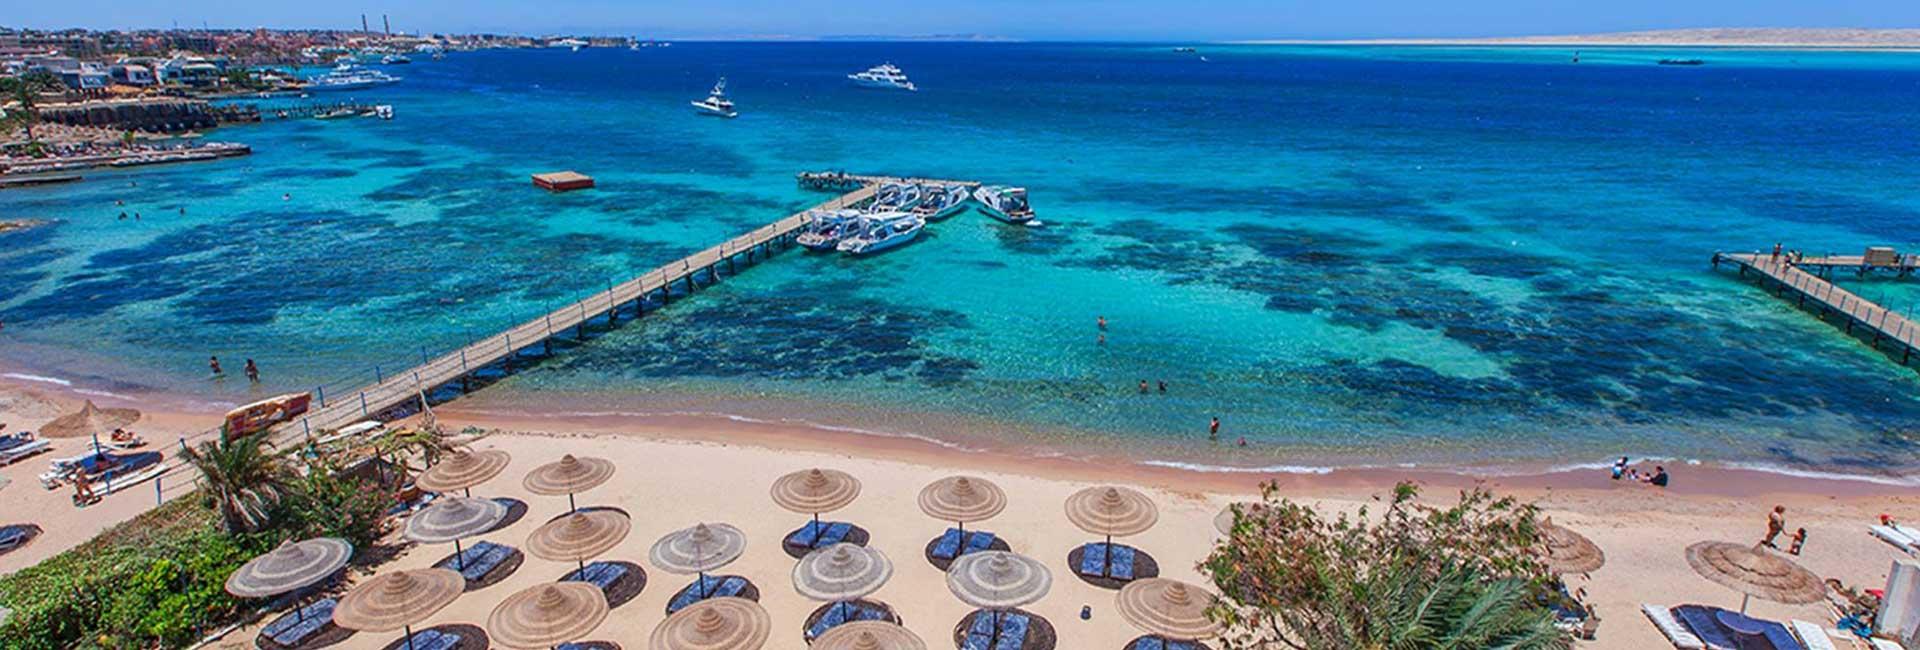 Hurghada Information